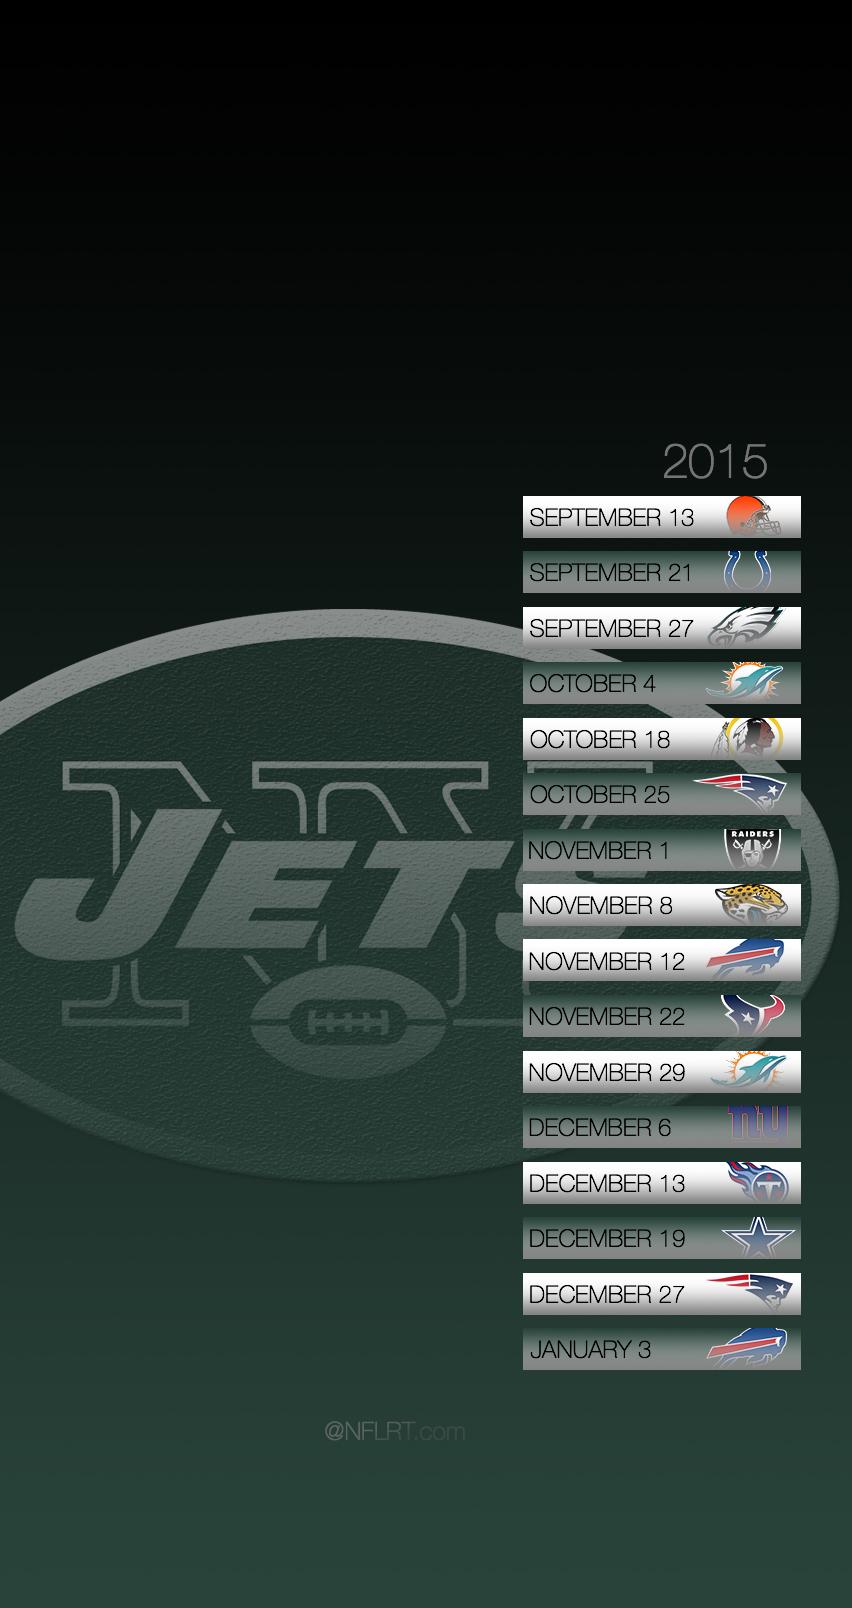 40 New York Jets Wallpaper 2015 On Wallpapersafari